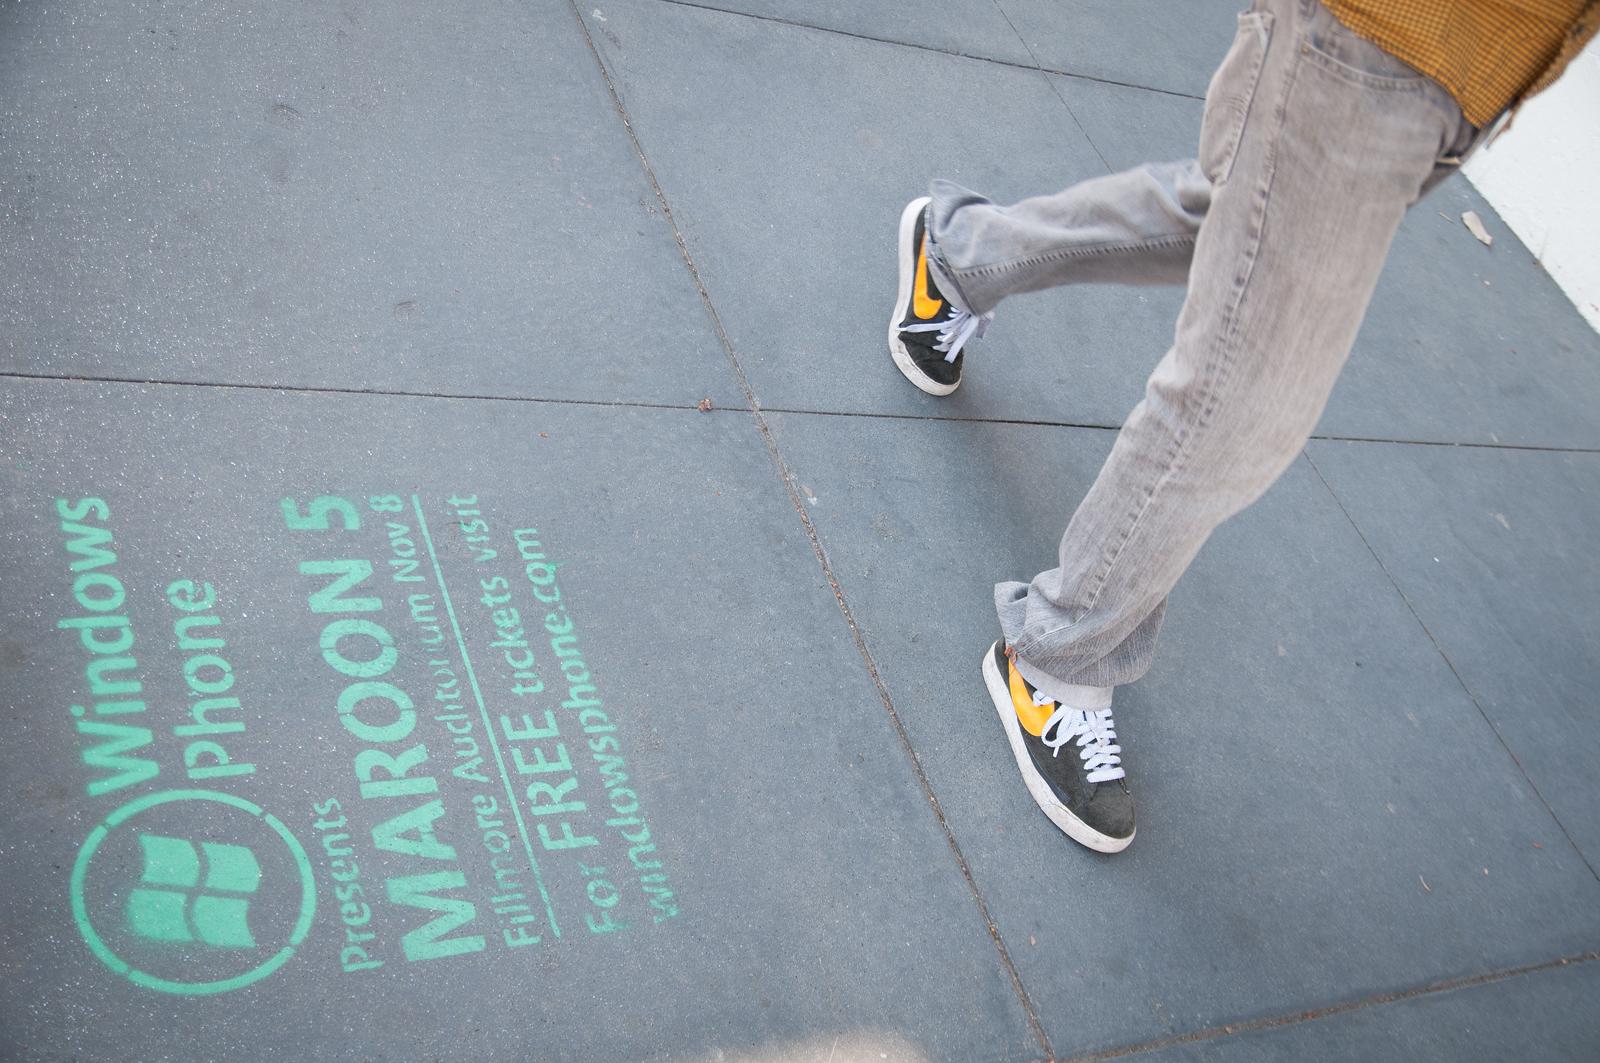 Graffiti Campaign for Microsoft's New Phone Illegal